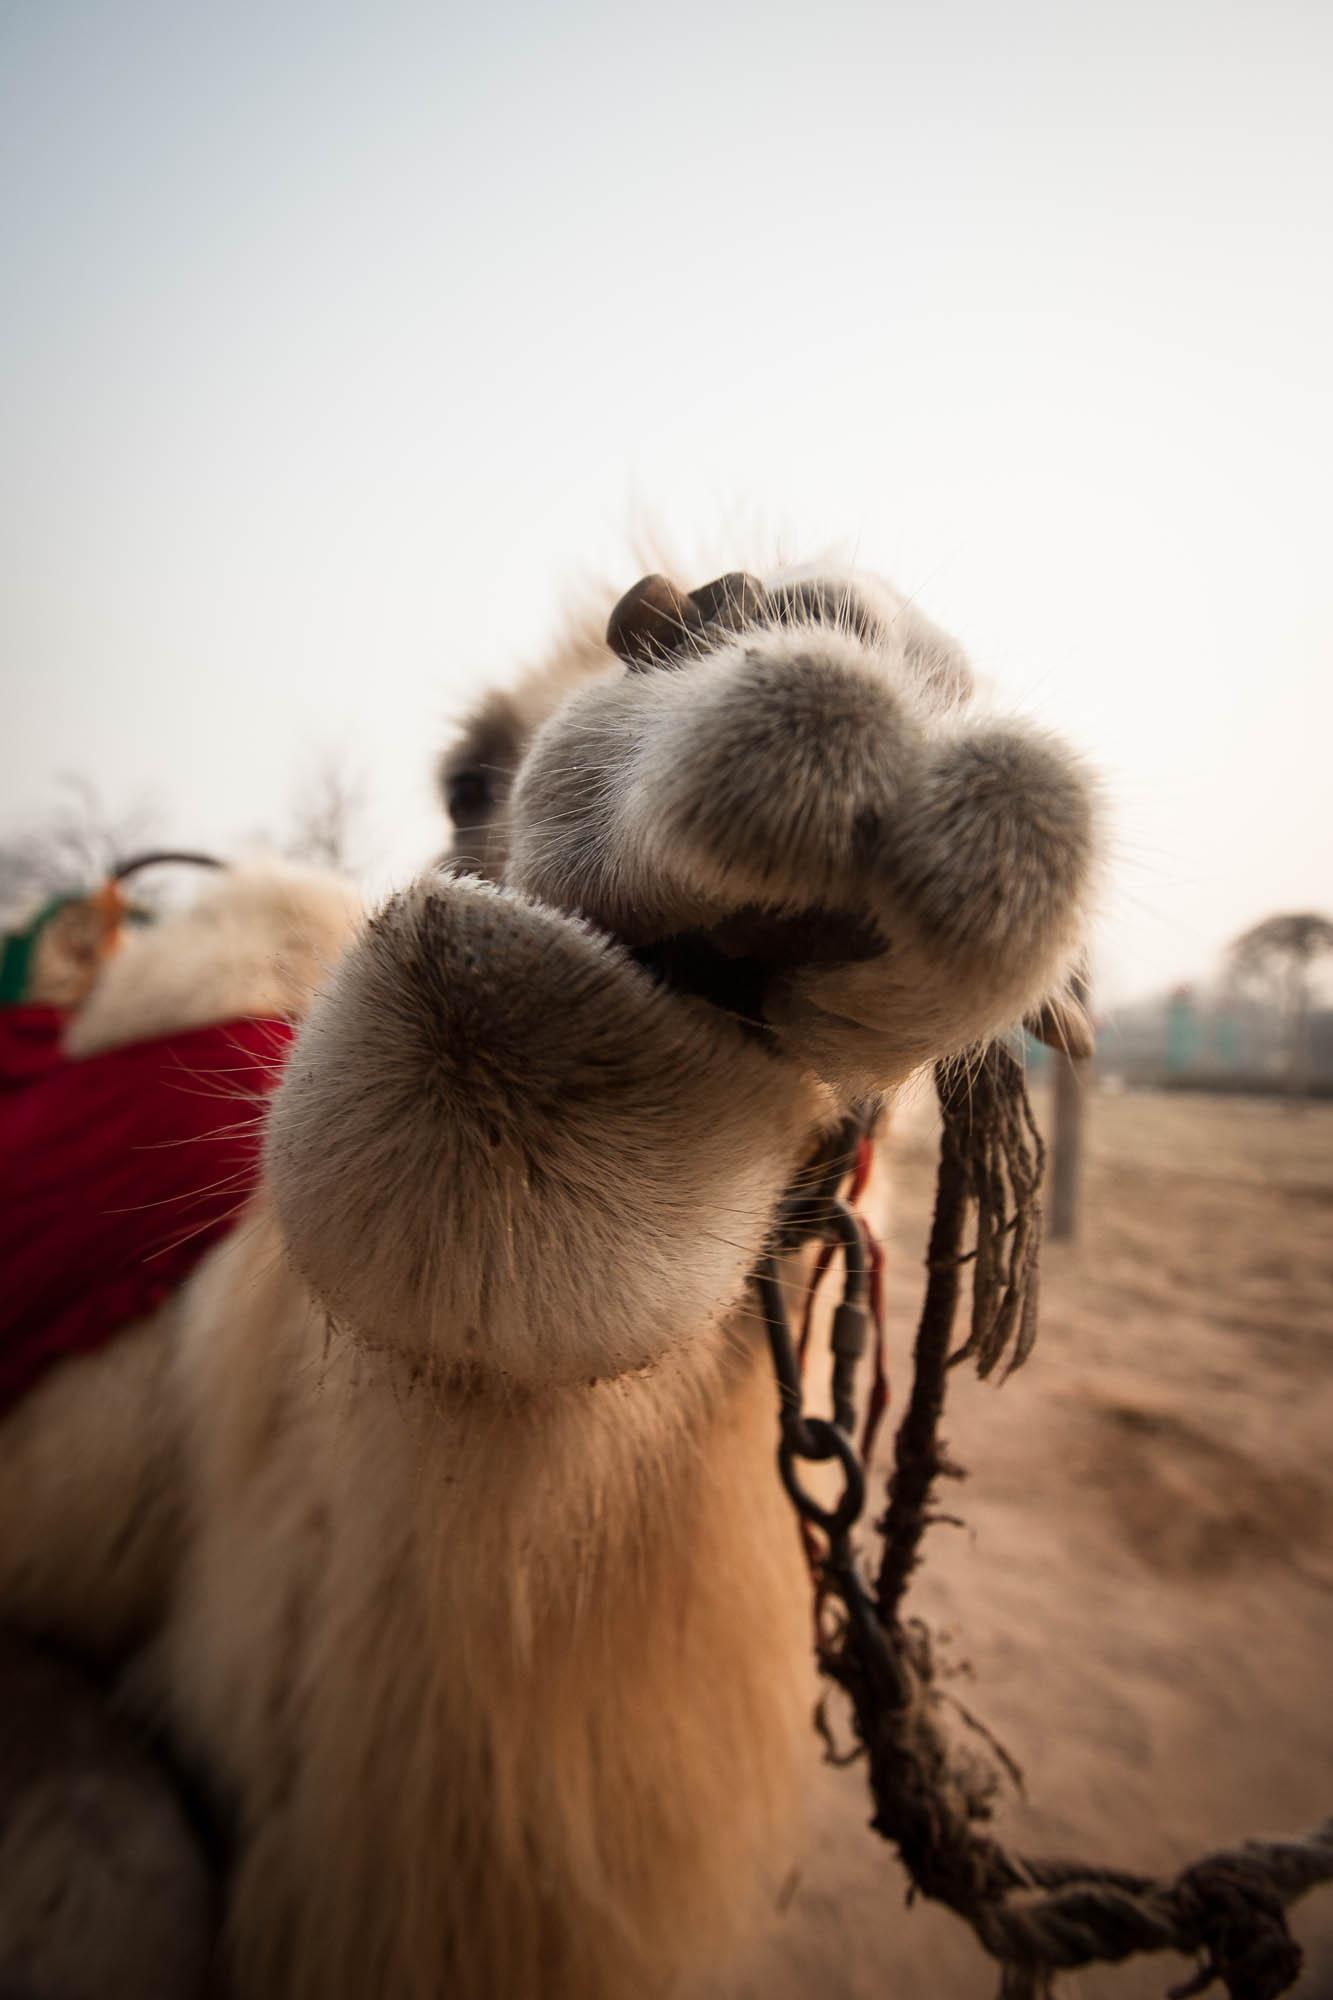 foolish camel